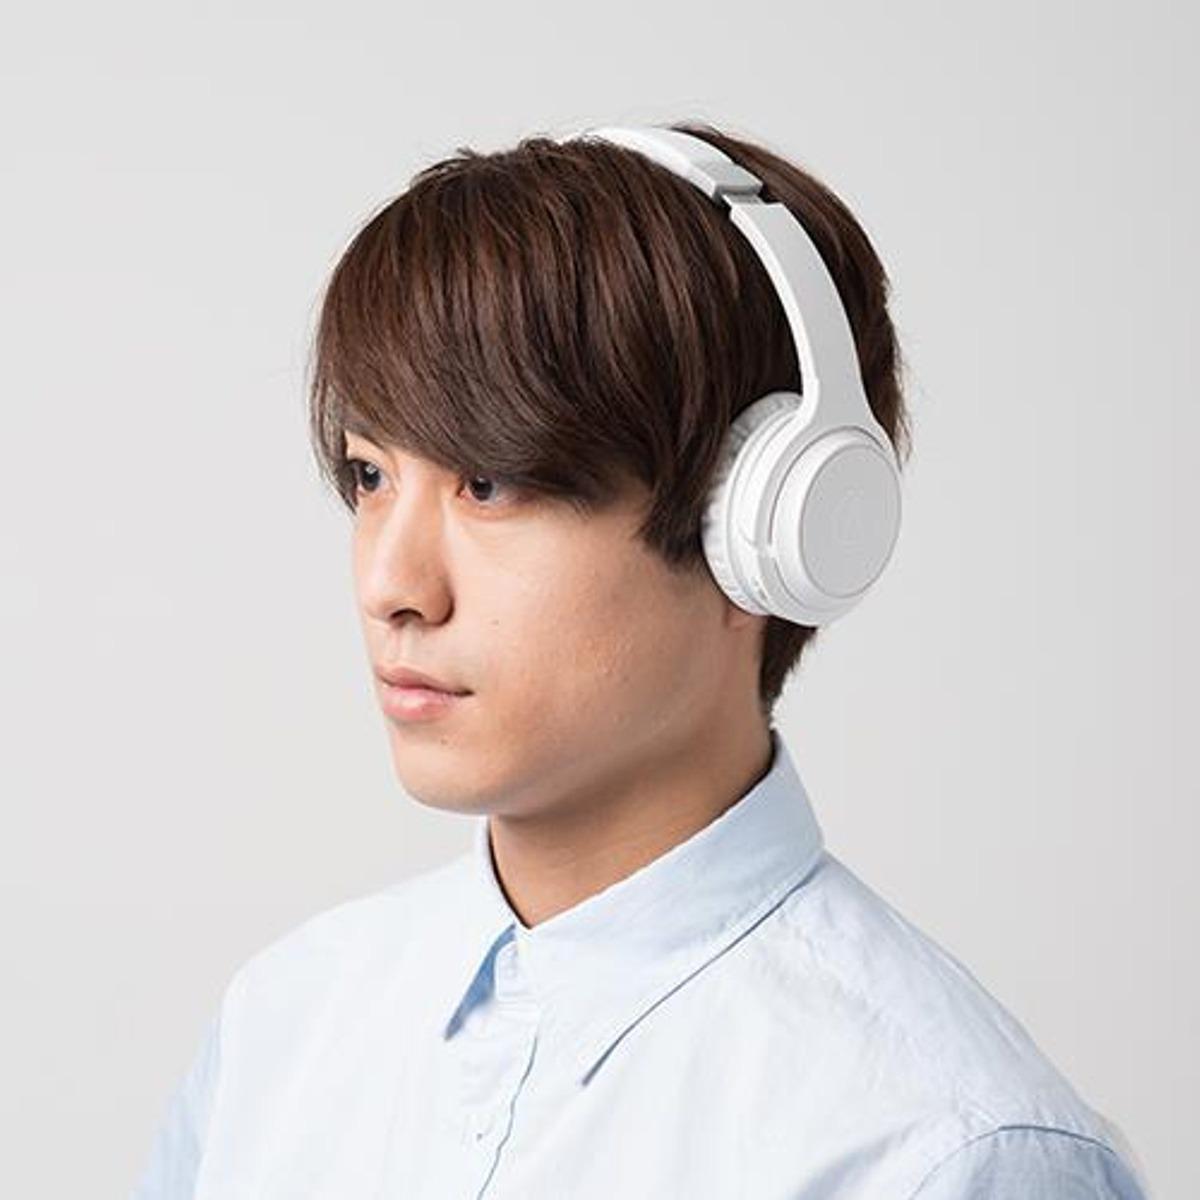 Audio Technica Ath S200bt Wh Auriculares Inalmbricos 329900 S200 Bt Headphone On Ear Black Cargando Zoom